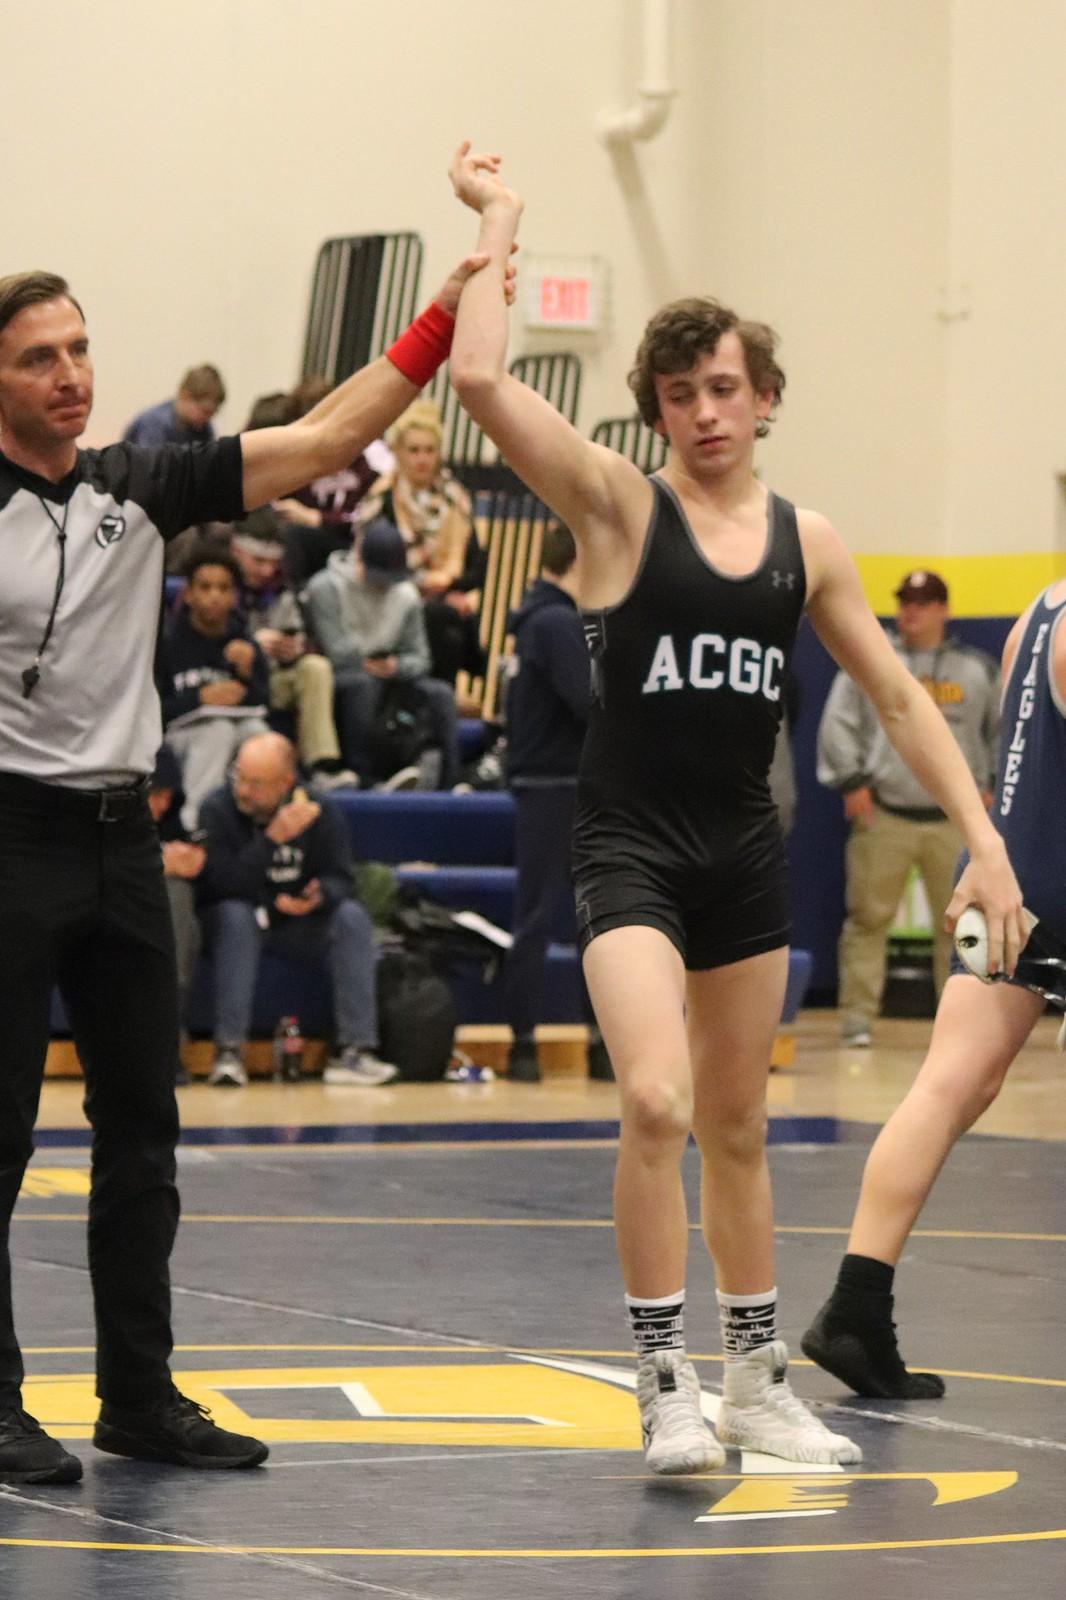 2019 Section 4A Semi -Finals ACGC 71 - EVW 3 Feb 15, 2019